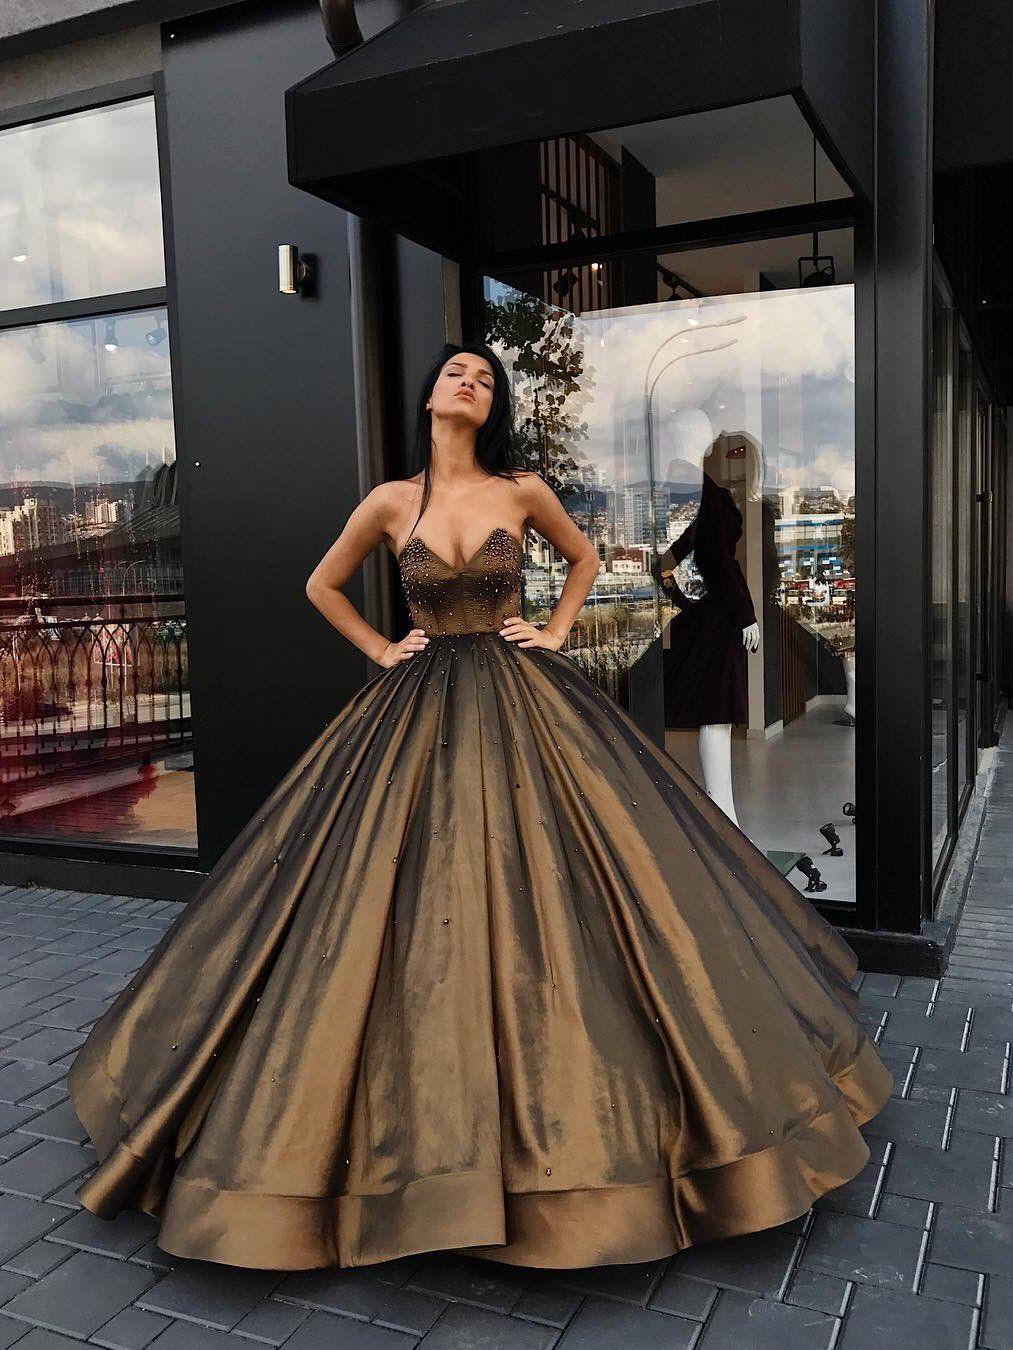 Ball Gown Prom Dresses Sweetheart Floor-length Brown Long Prom Dress Evening  Dress JKL328 67fb450af58c